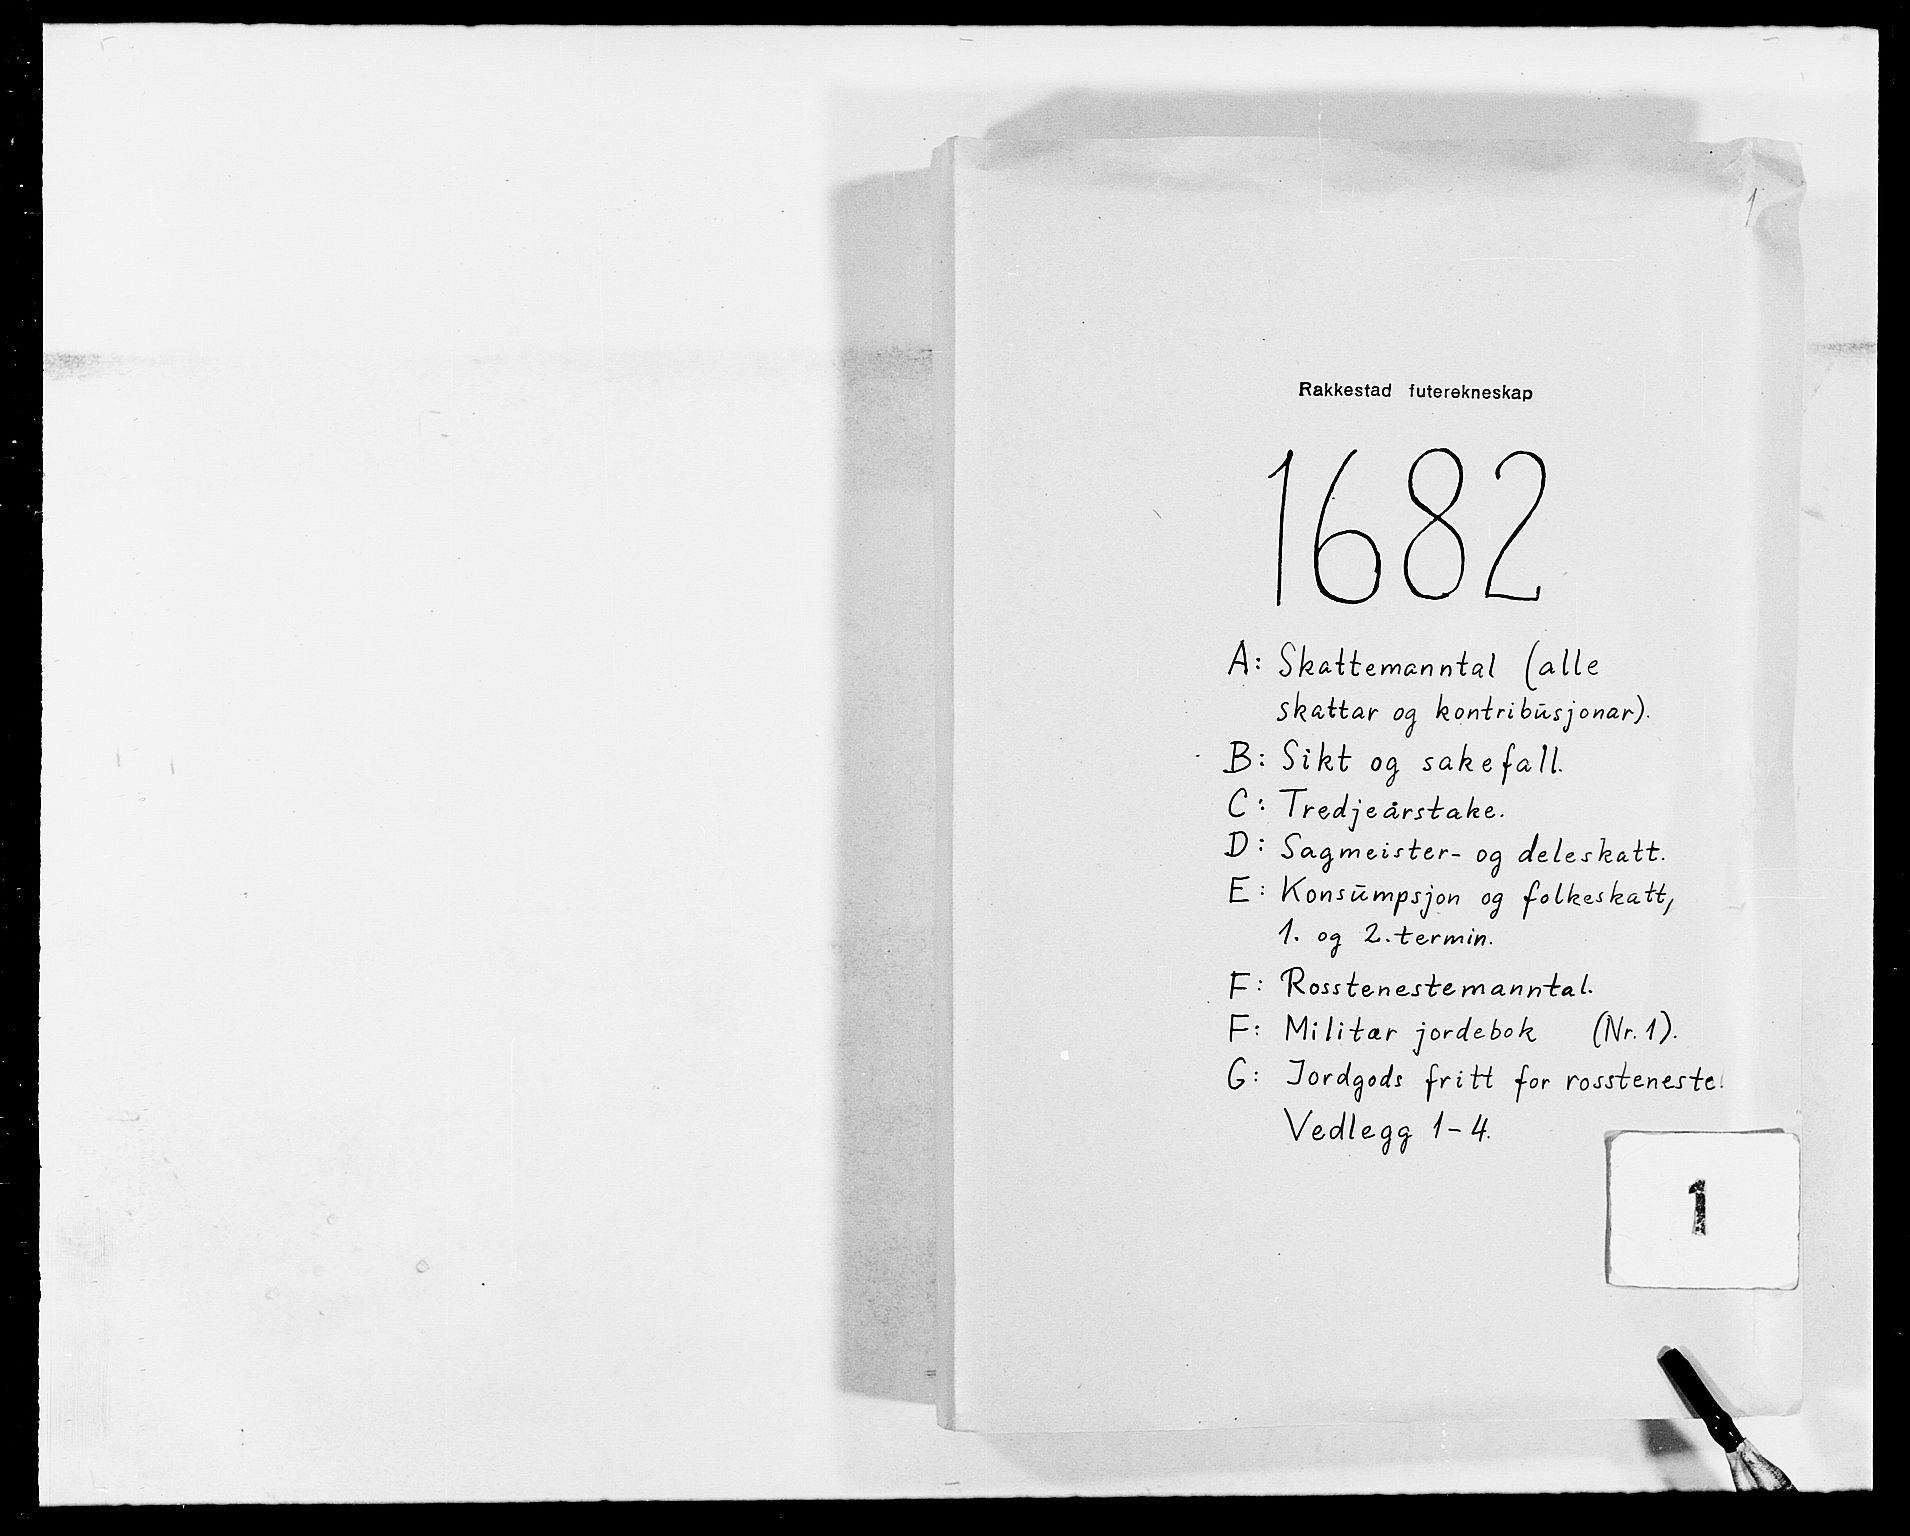 RA, Rentekammeret inntil 1814, Reviderte regnskaper, Fogderegnskap, R05/L0273: Fogderegnskap Rakkestad, 1682, s. 1